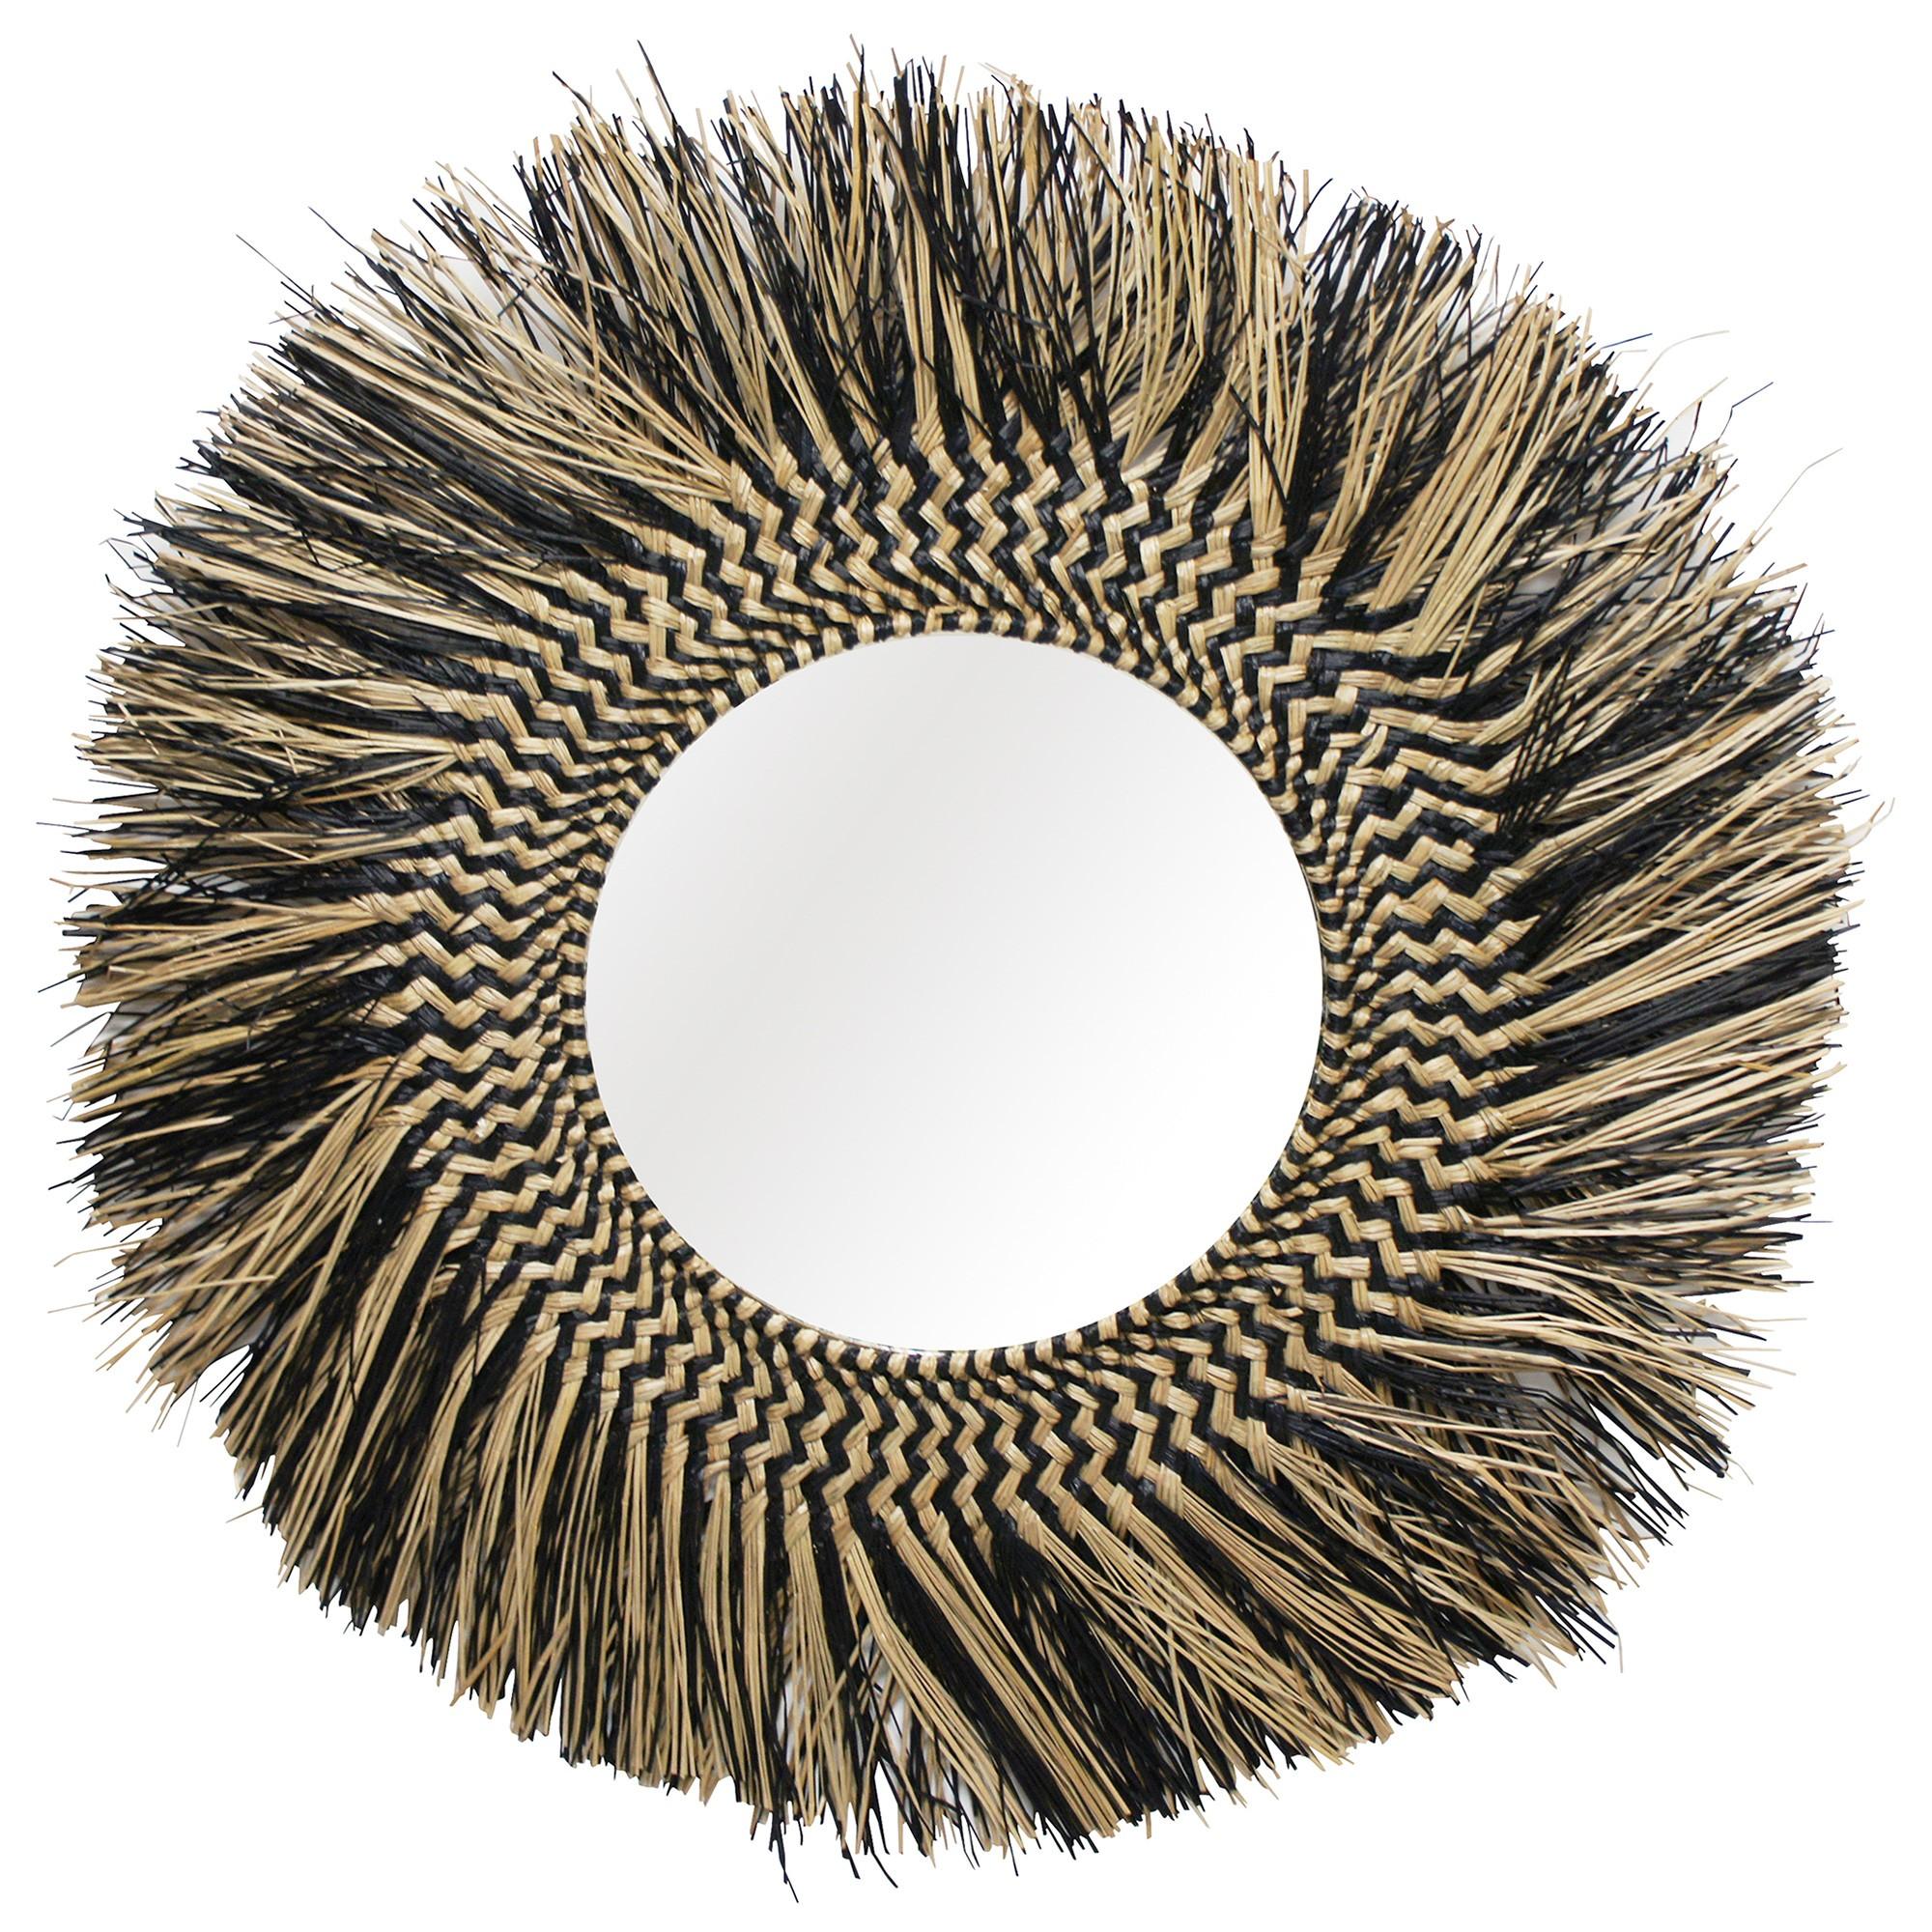 Dafril Pandanus Round Wall Mirror, 95cm